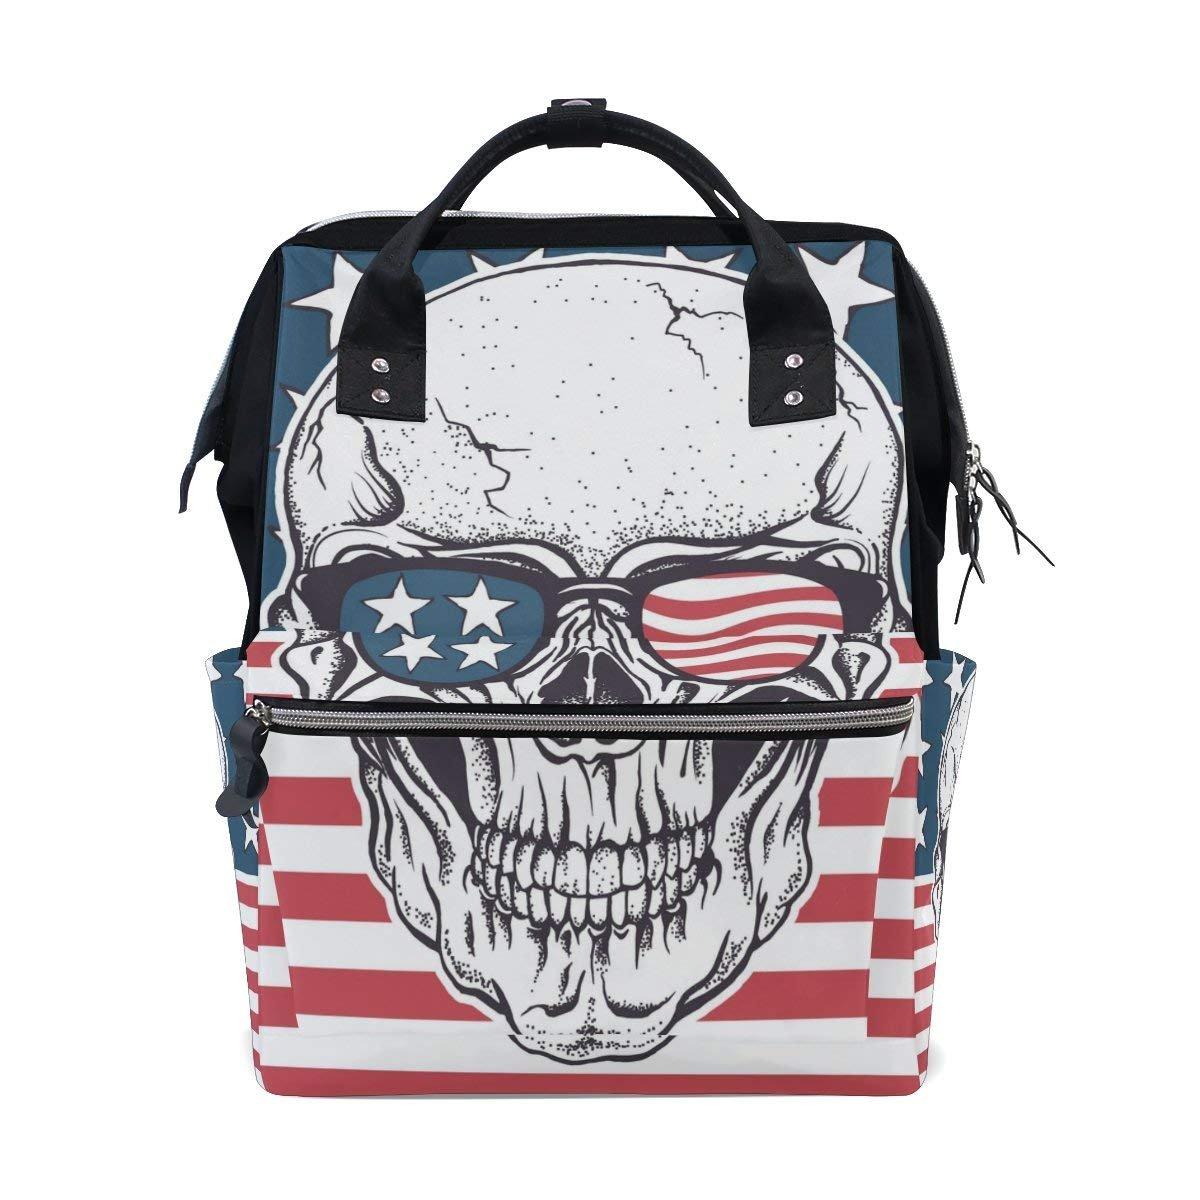 American Skull In Sunglasses Diaper Bags Mummy Backpack Multi Functions Bag